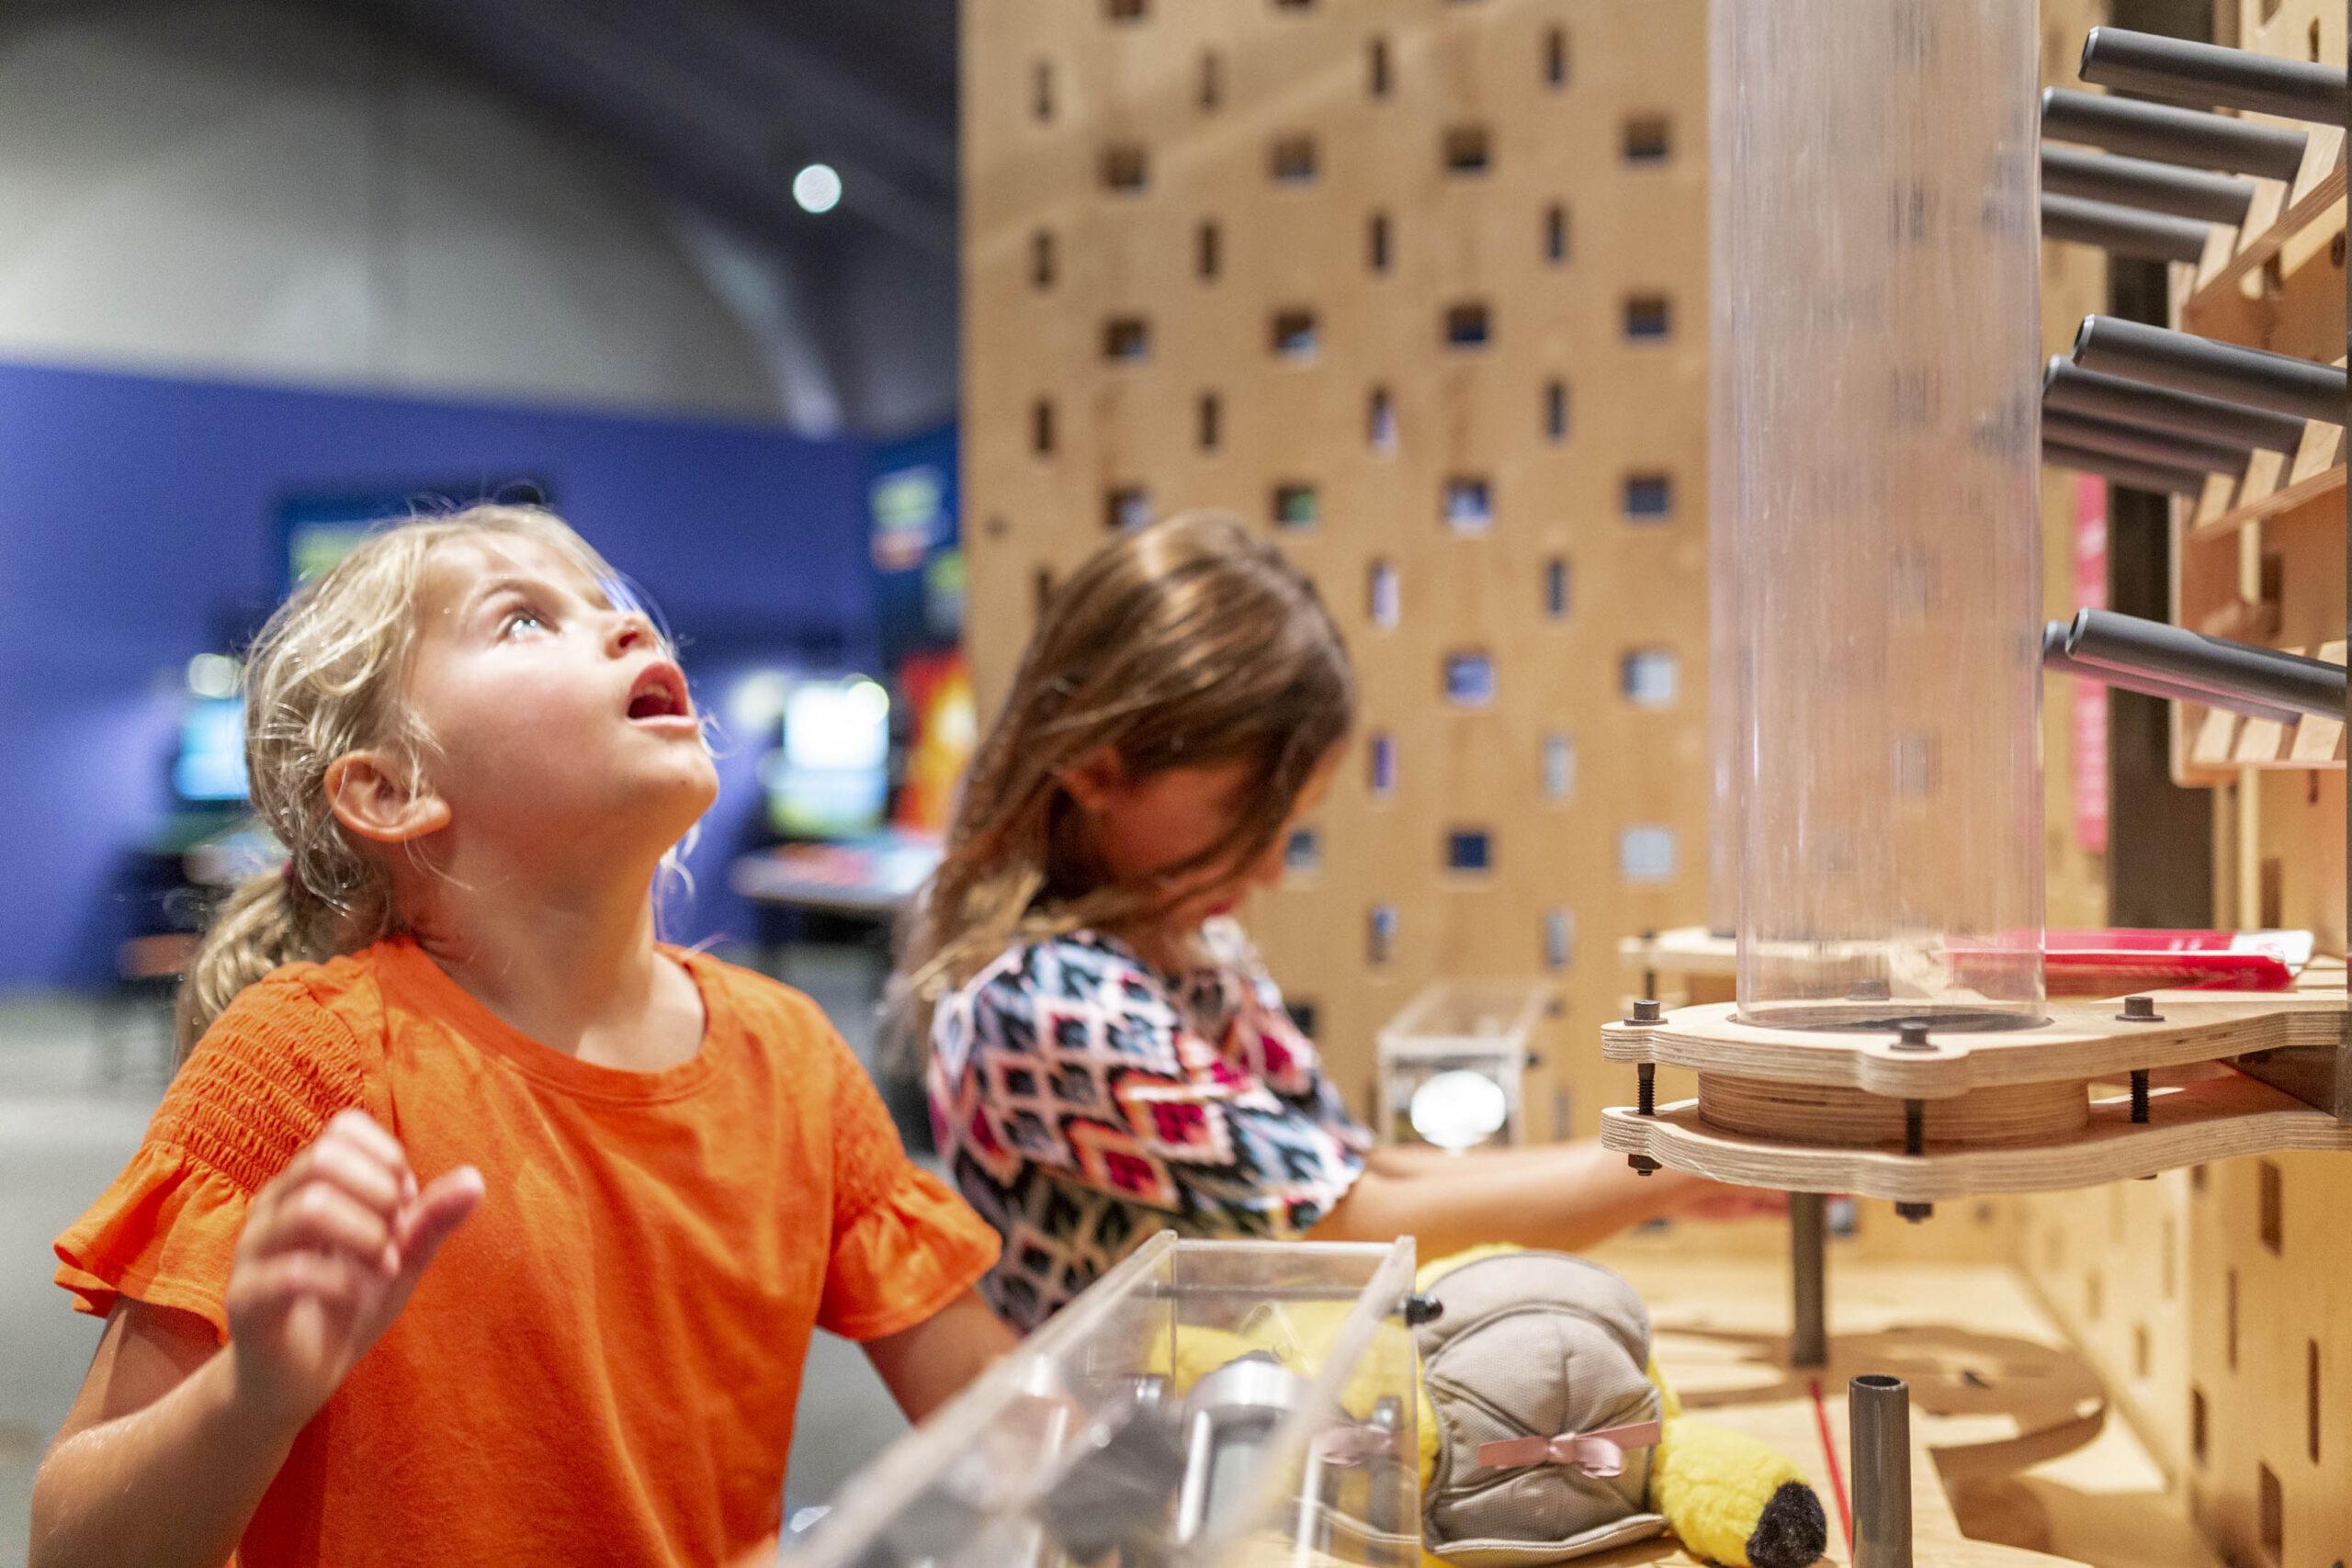 Two children exploring a science exhibit